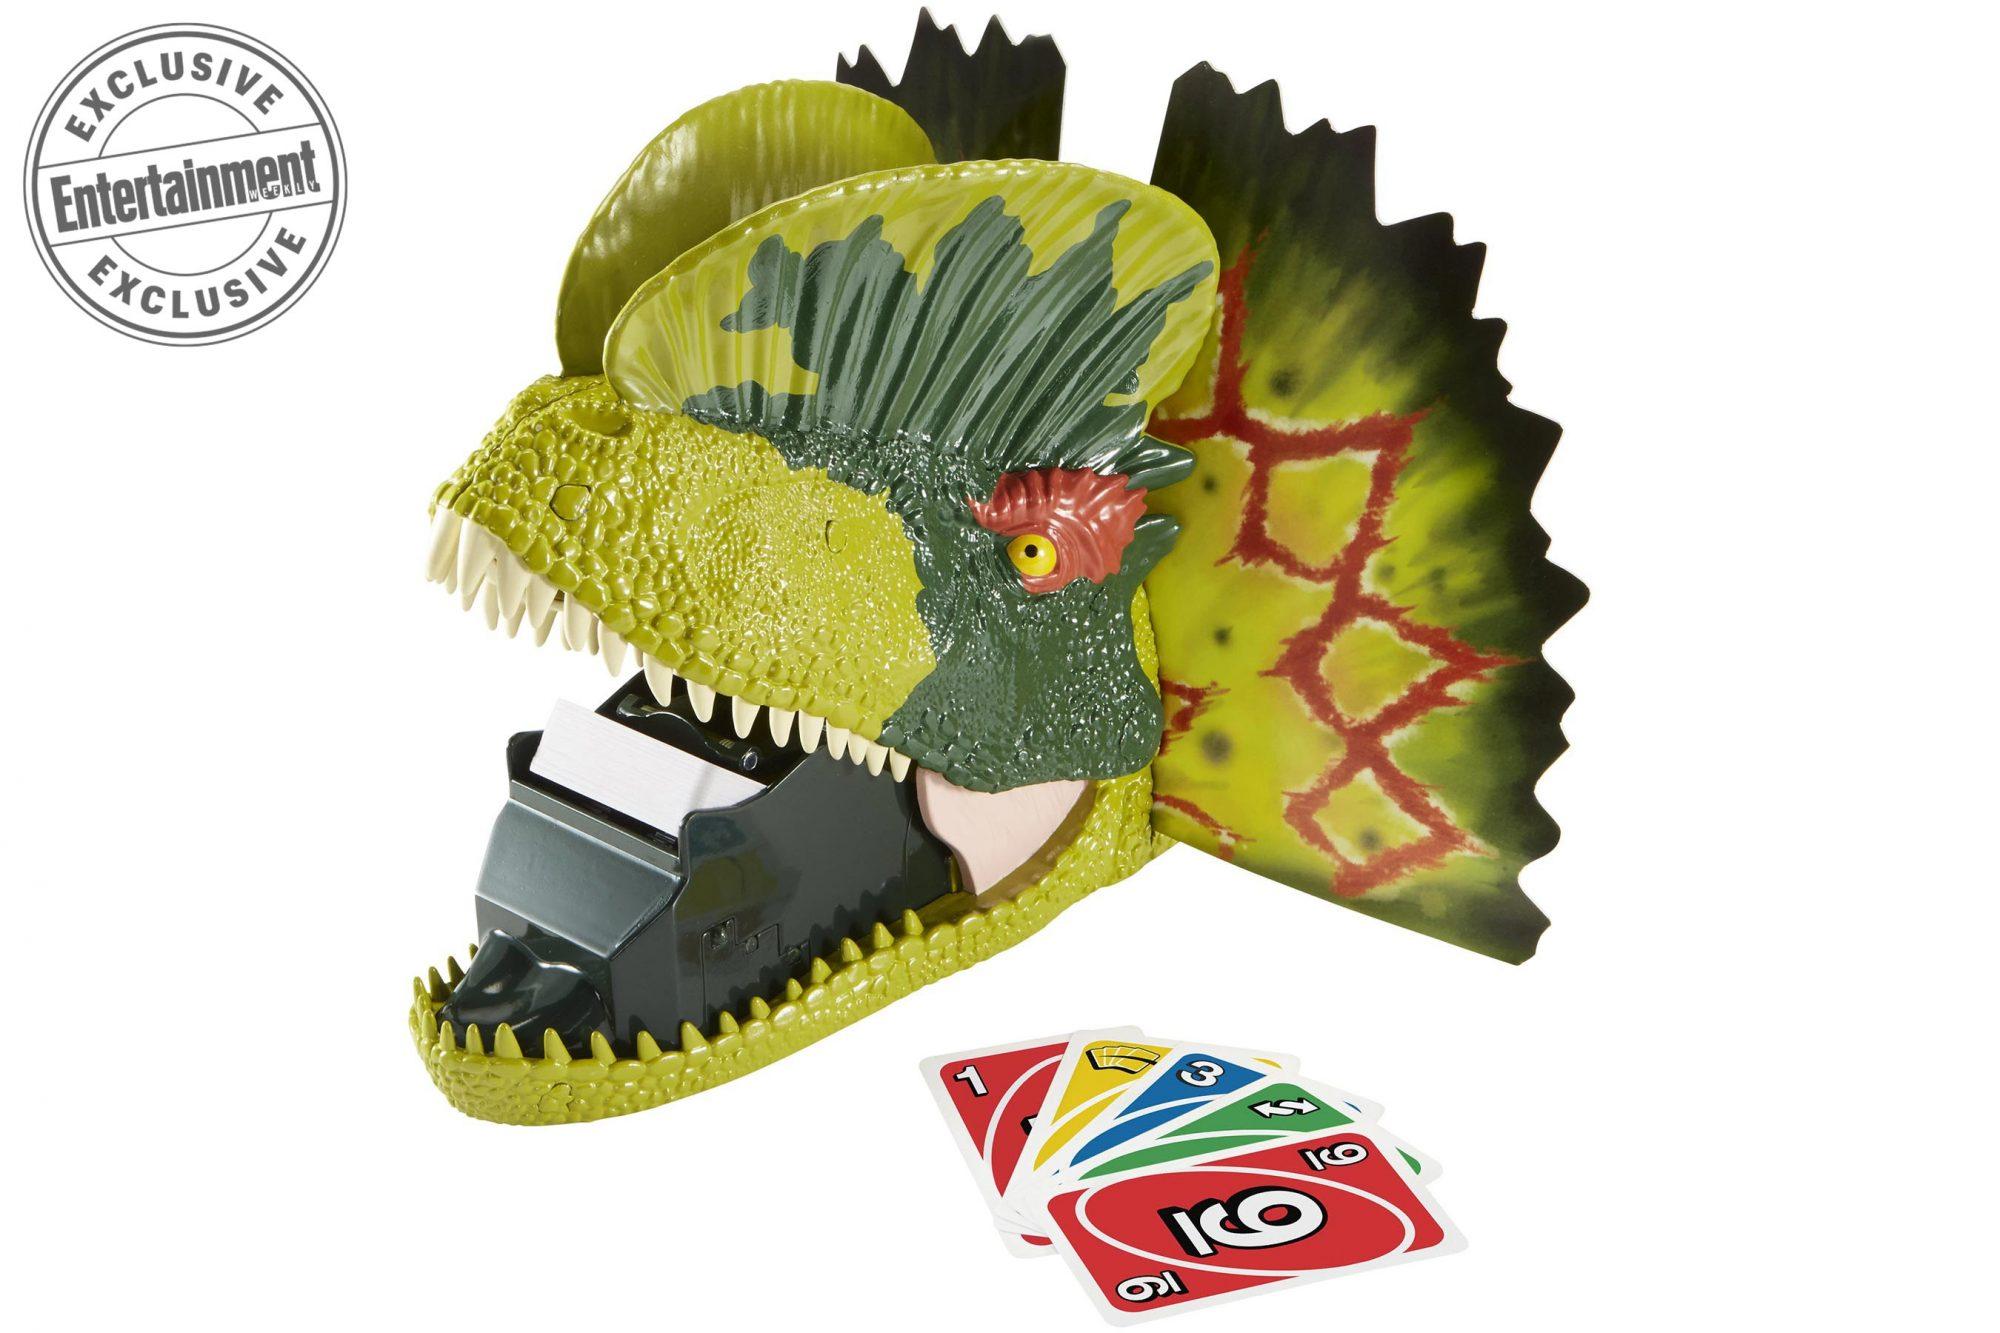 Jurassic-World-Toys-4